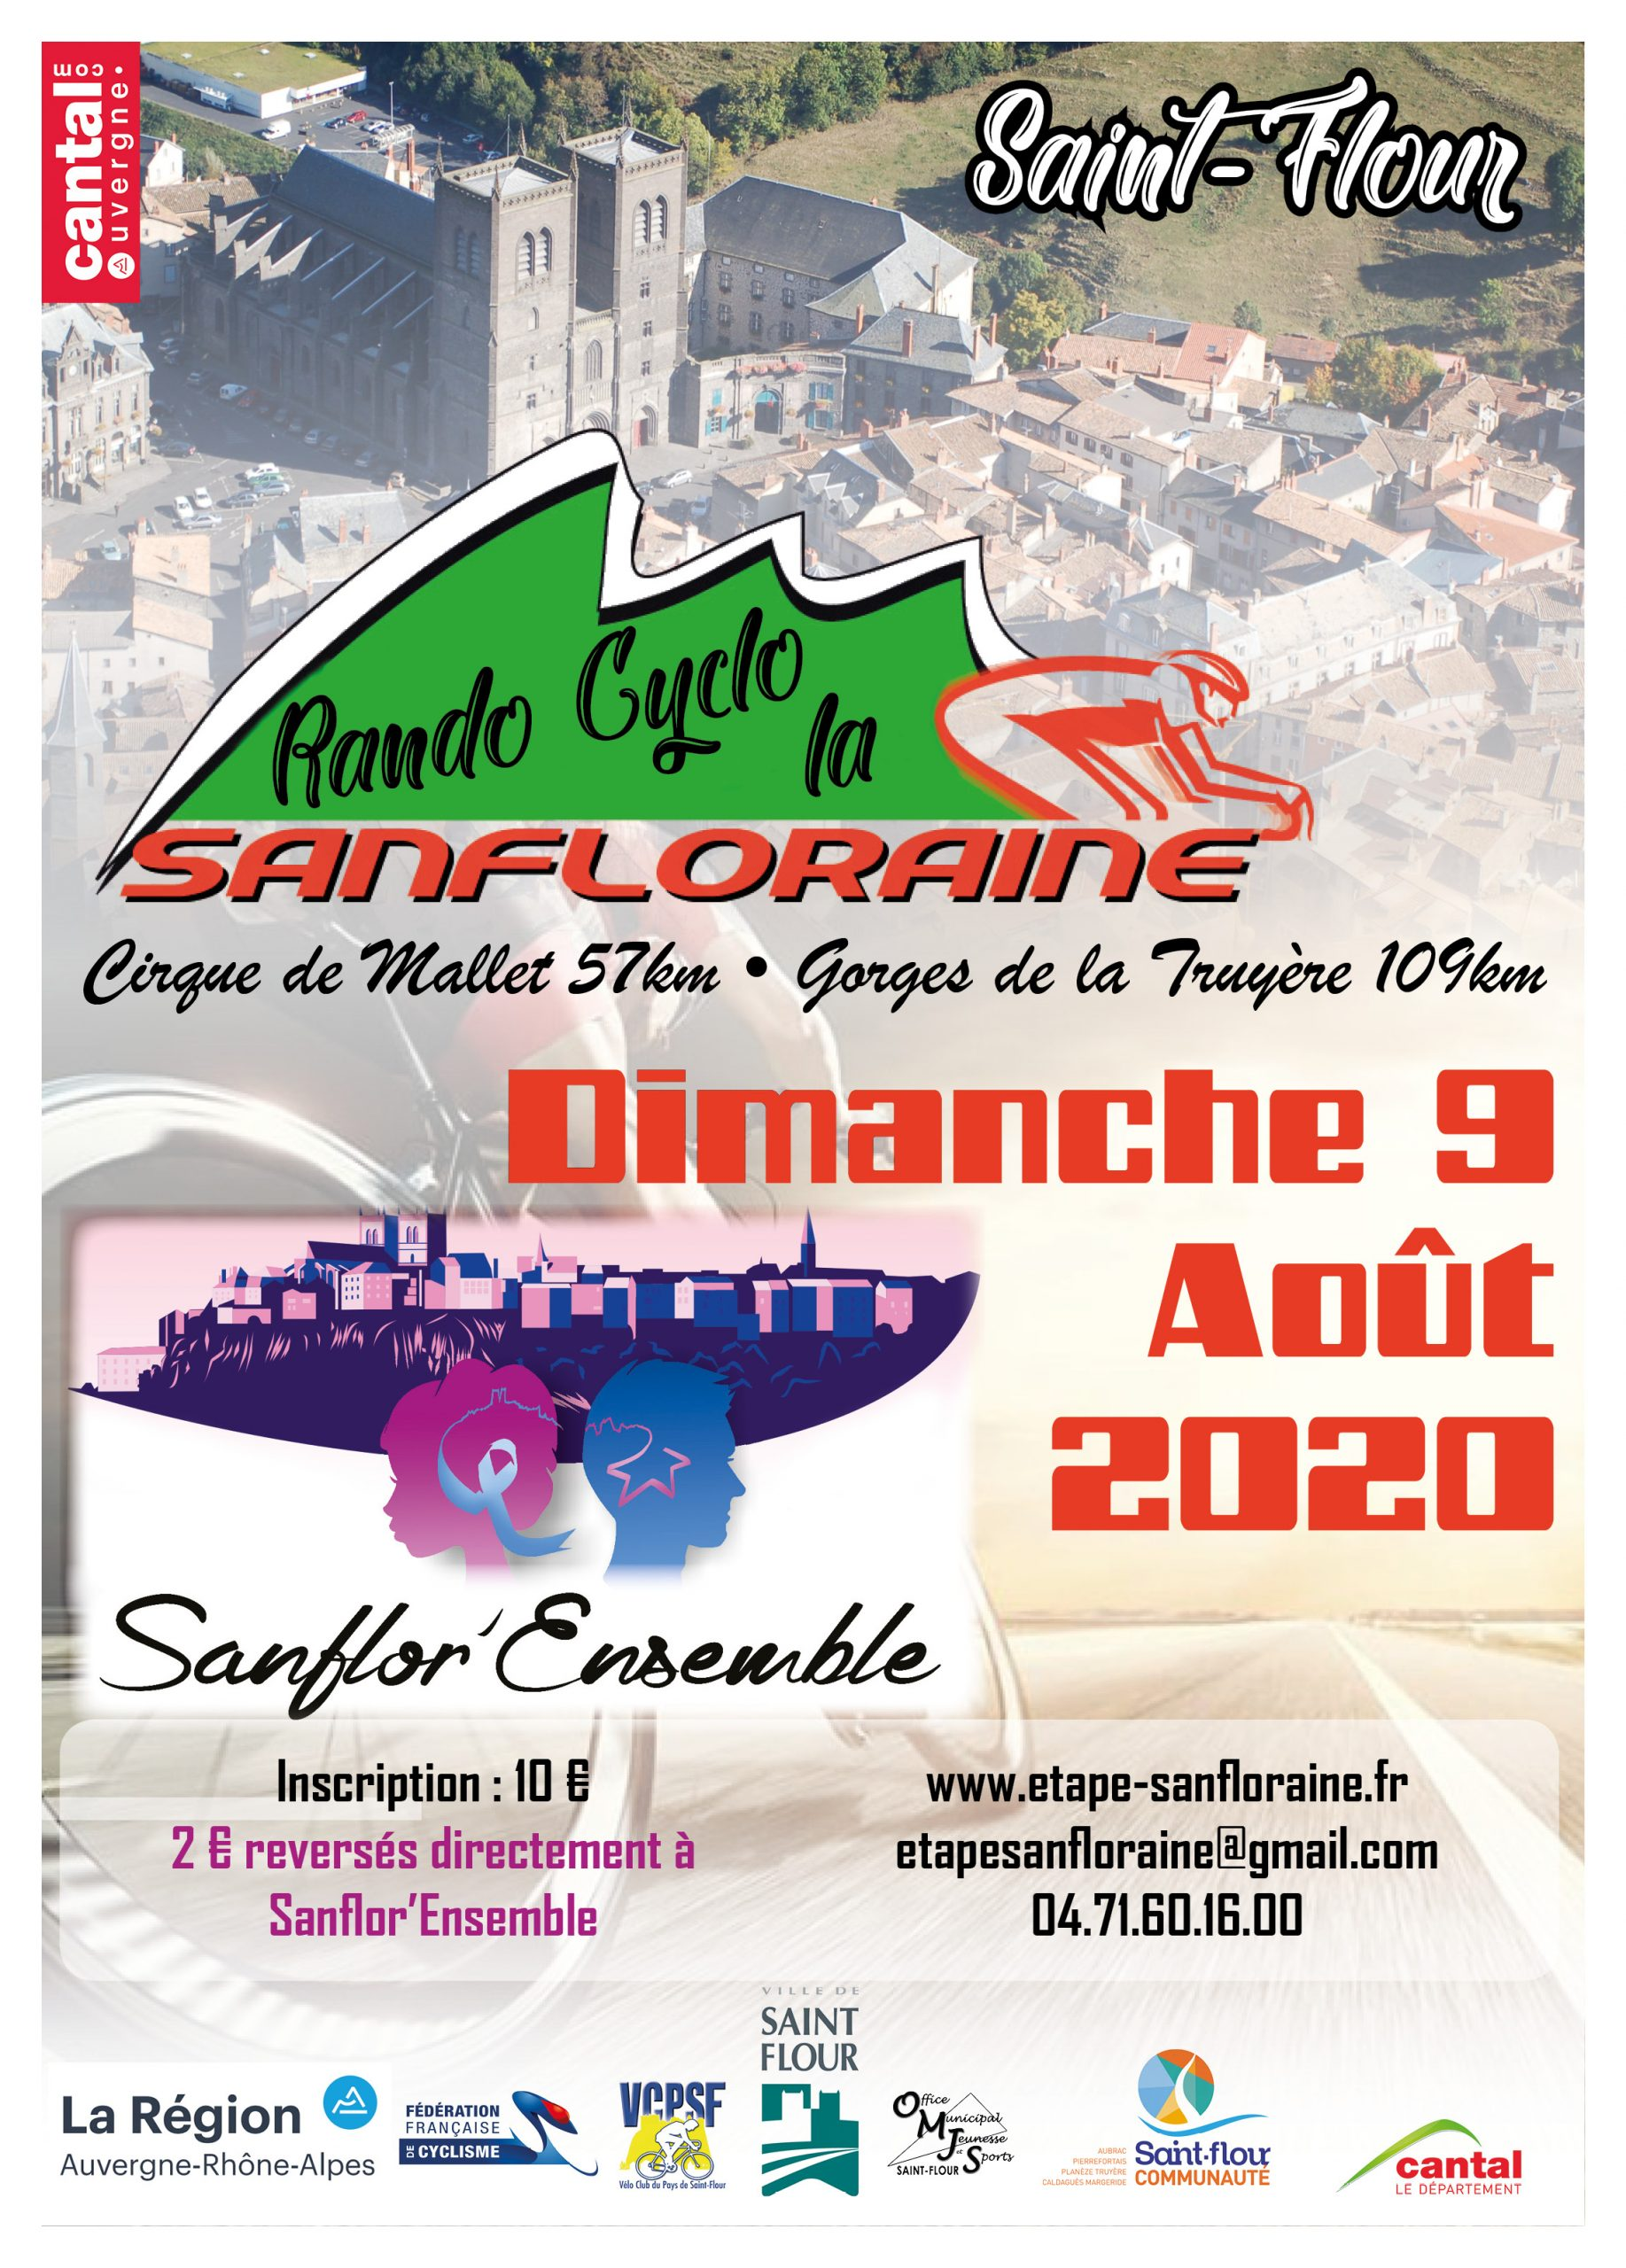 Affiche Rando Cyclo La Sanfloraine 2020